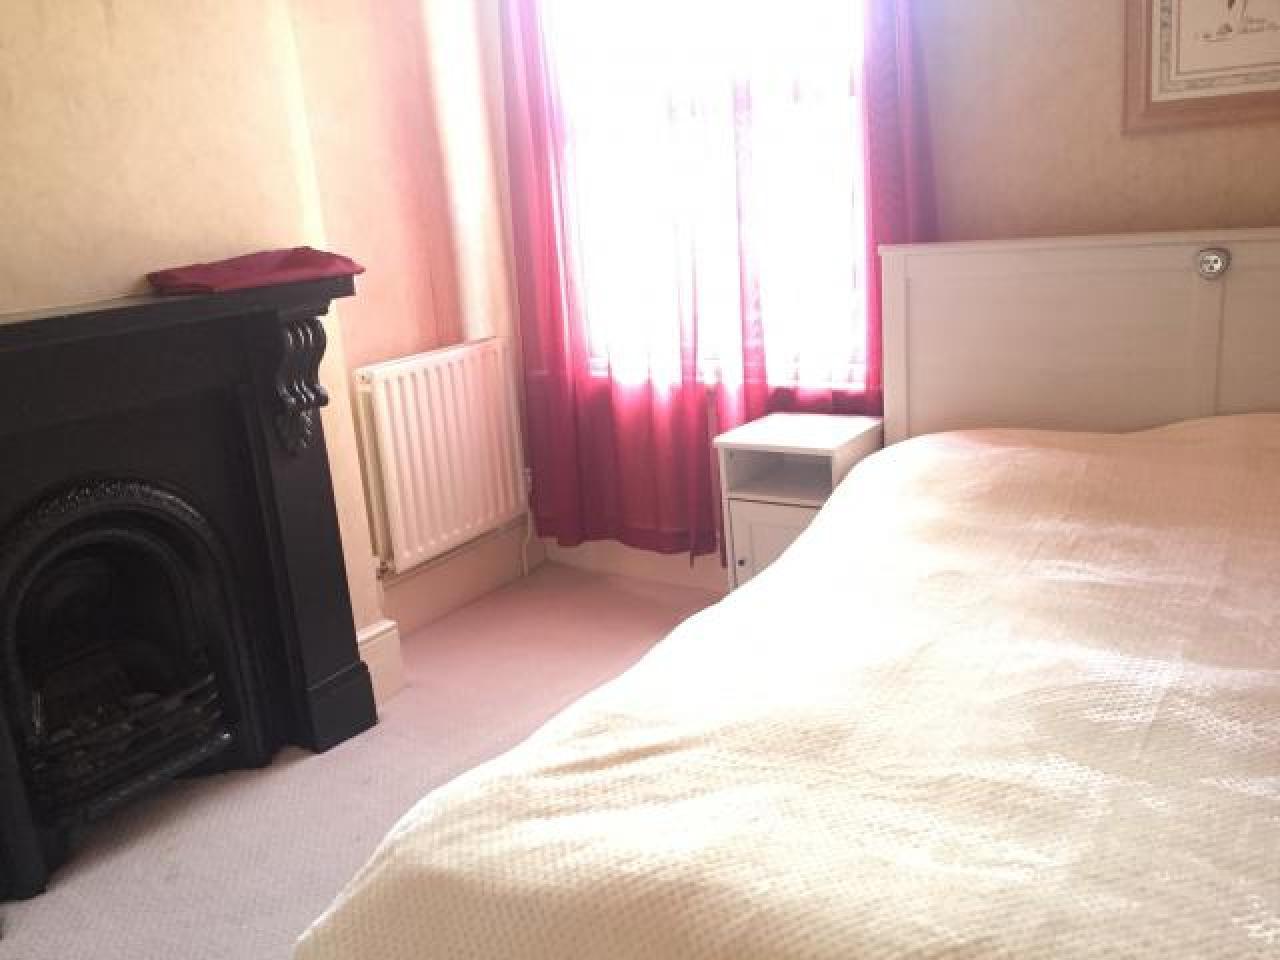 Дабл комната для одного человека - 4